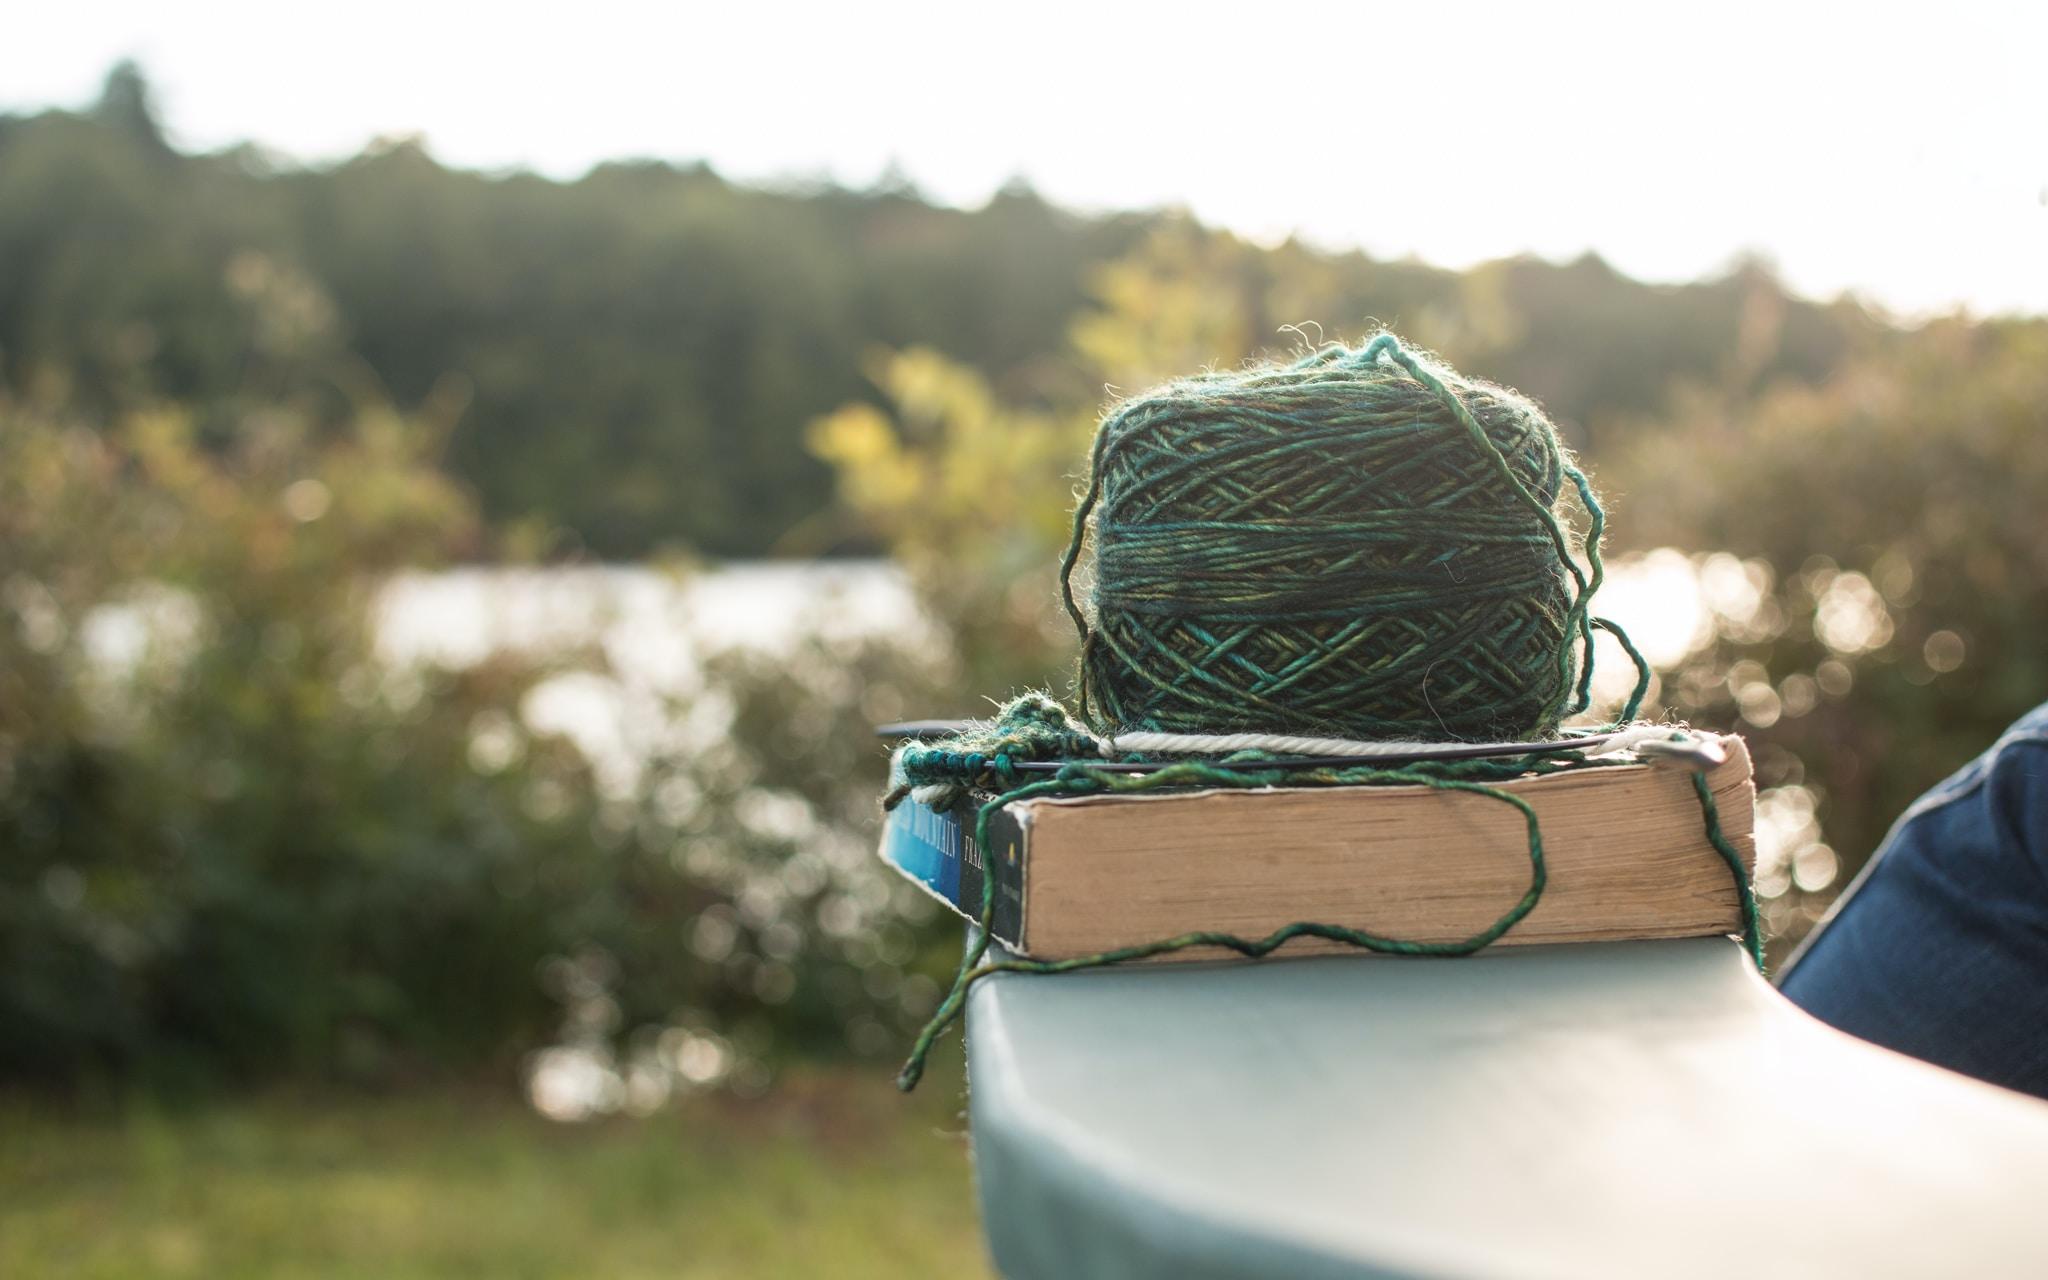 A ball of yarn on a book on a ledge near a lake